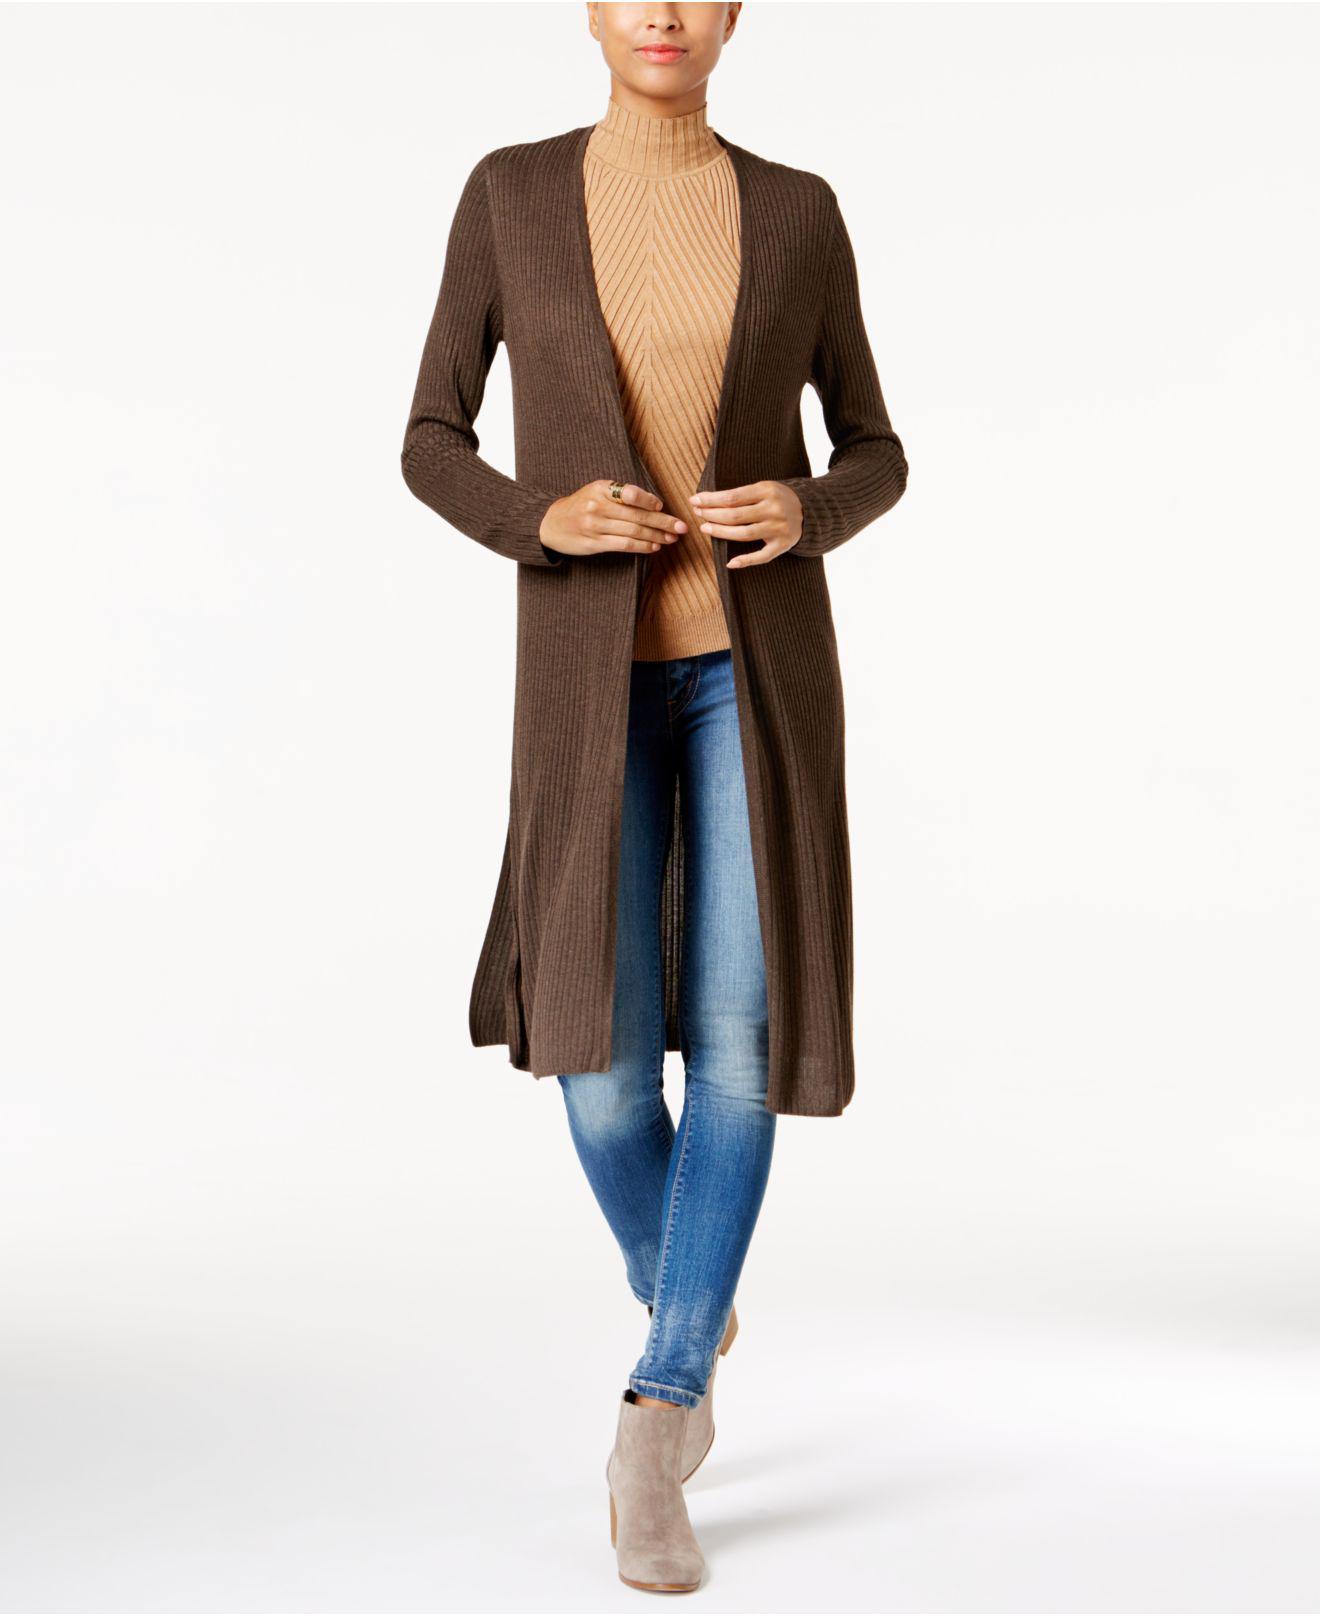 Inc international concepts Rib-knit Duster Cardigan in Brown | Lyst